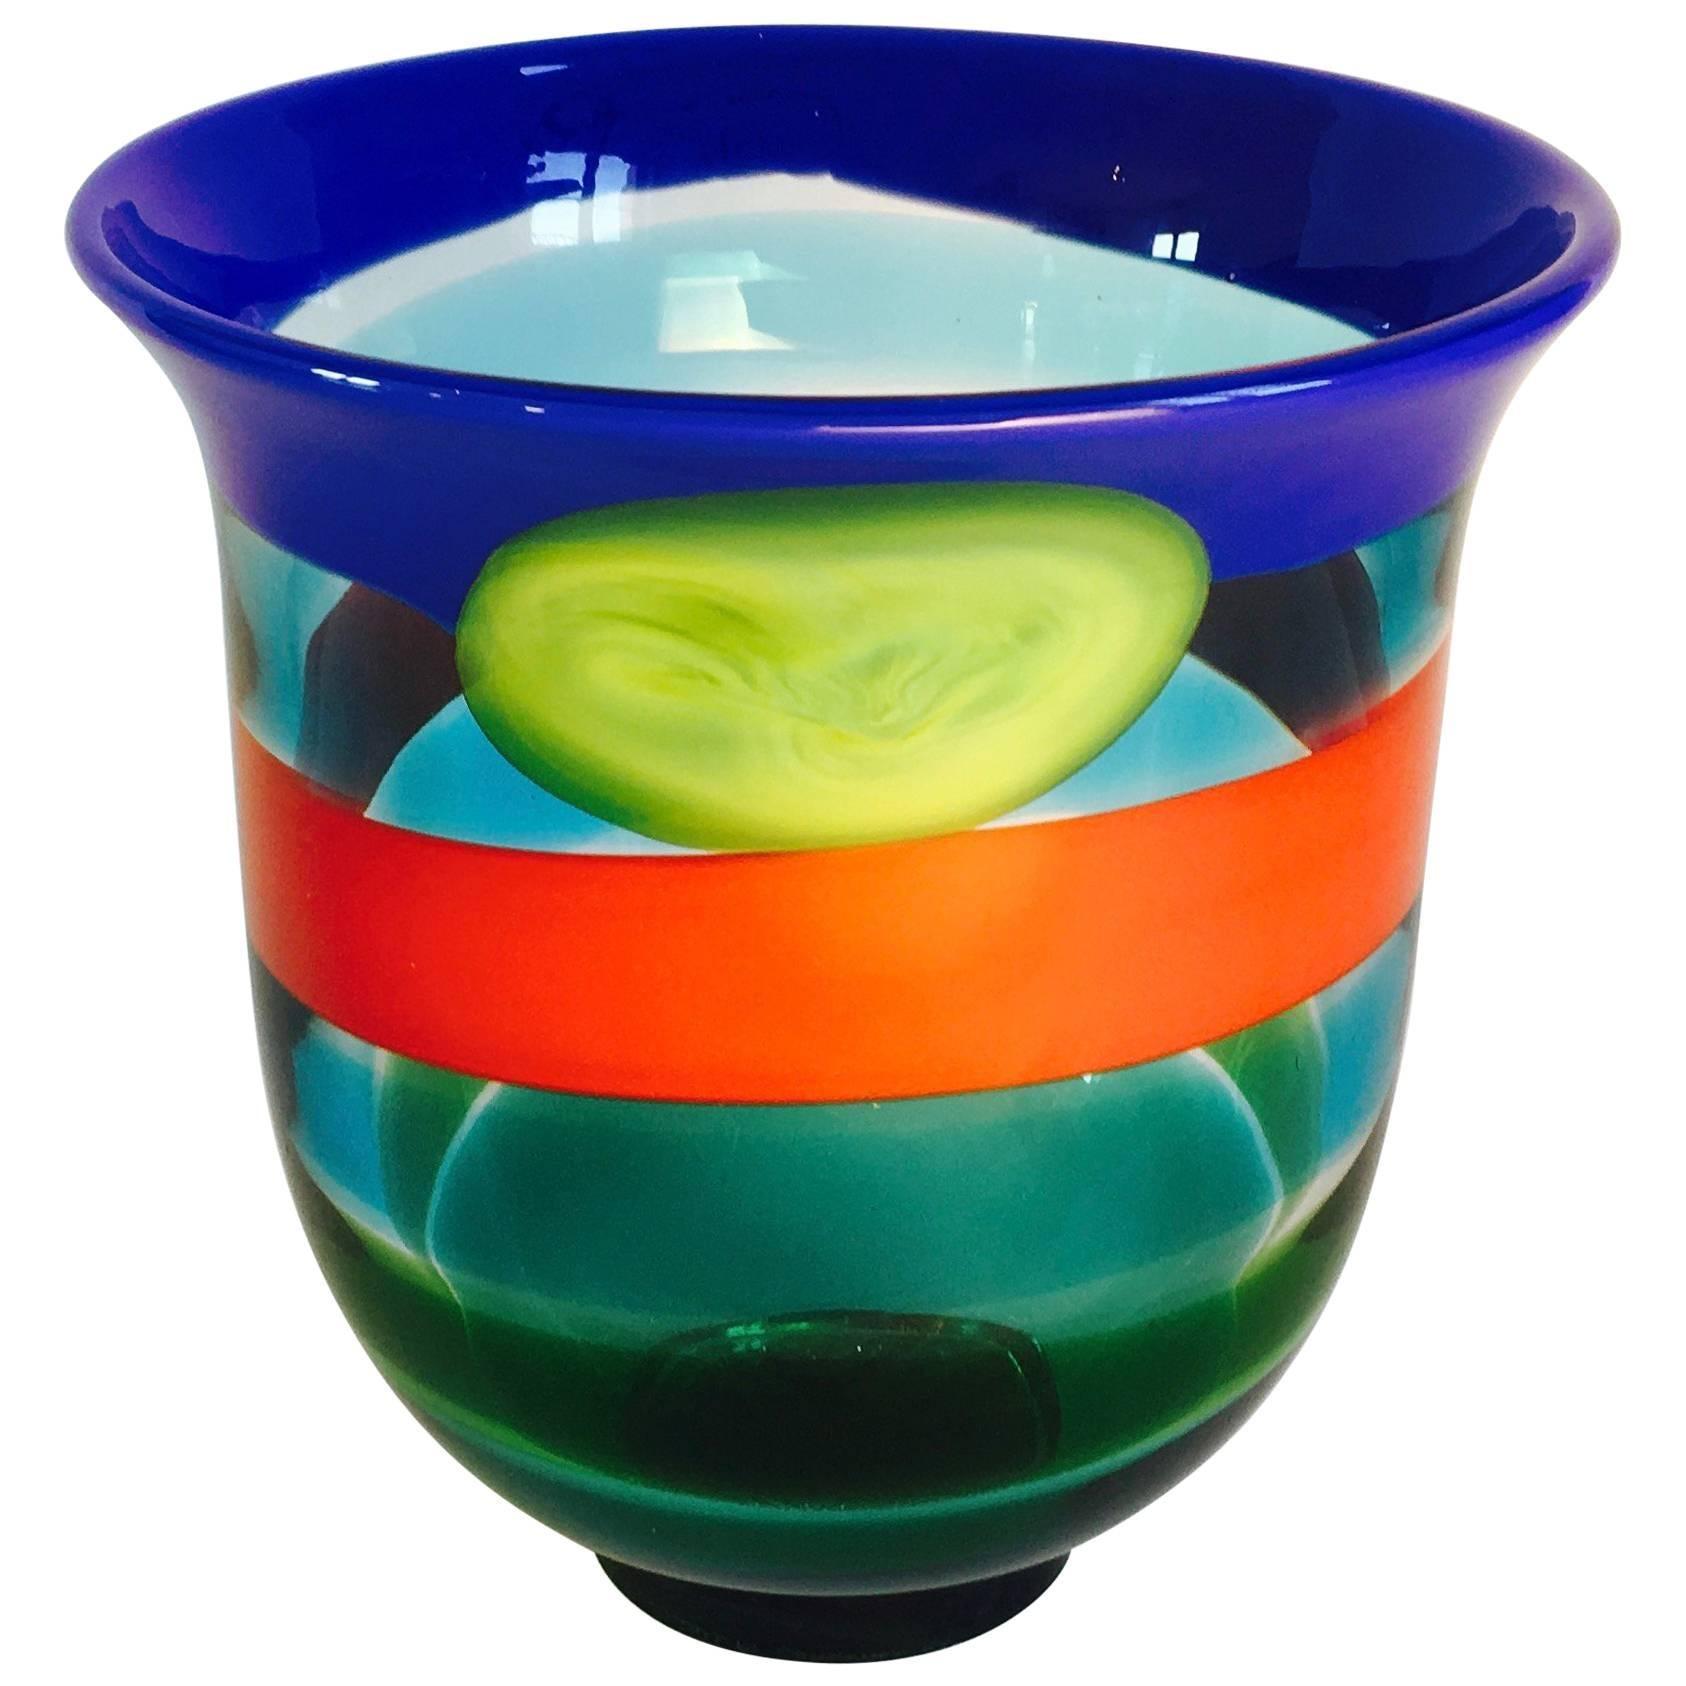 Italian Murano Glass Vase by Berit Johansson for Salviati.